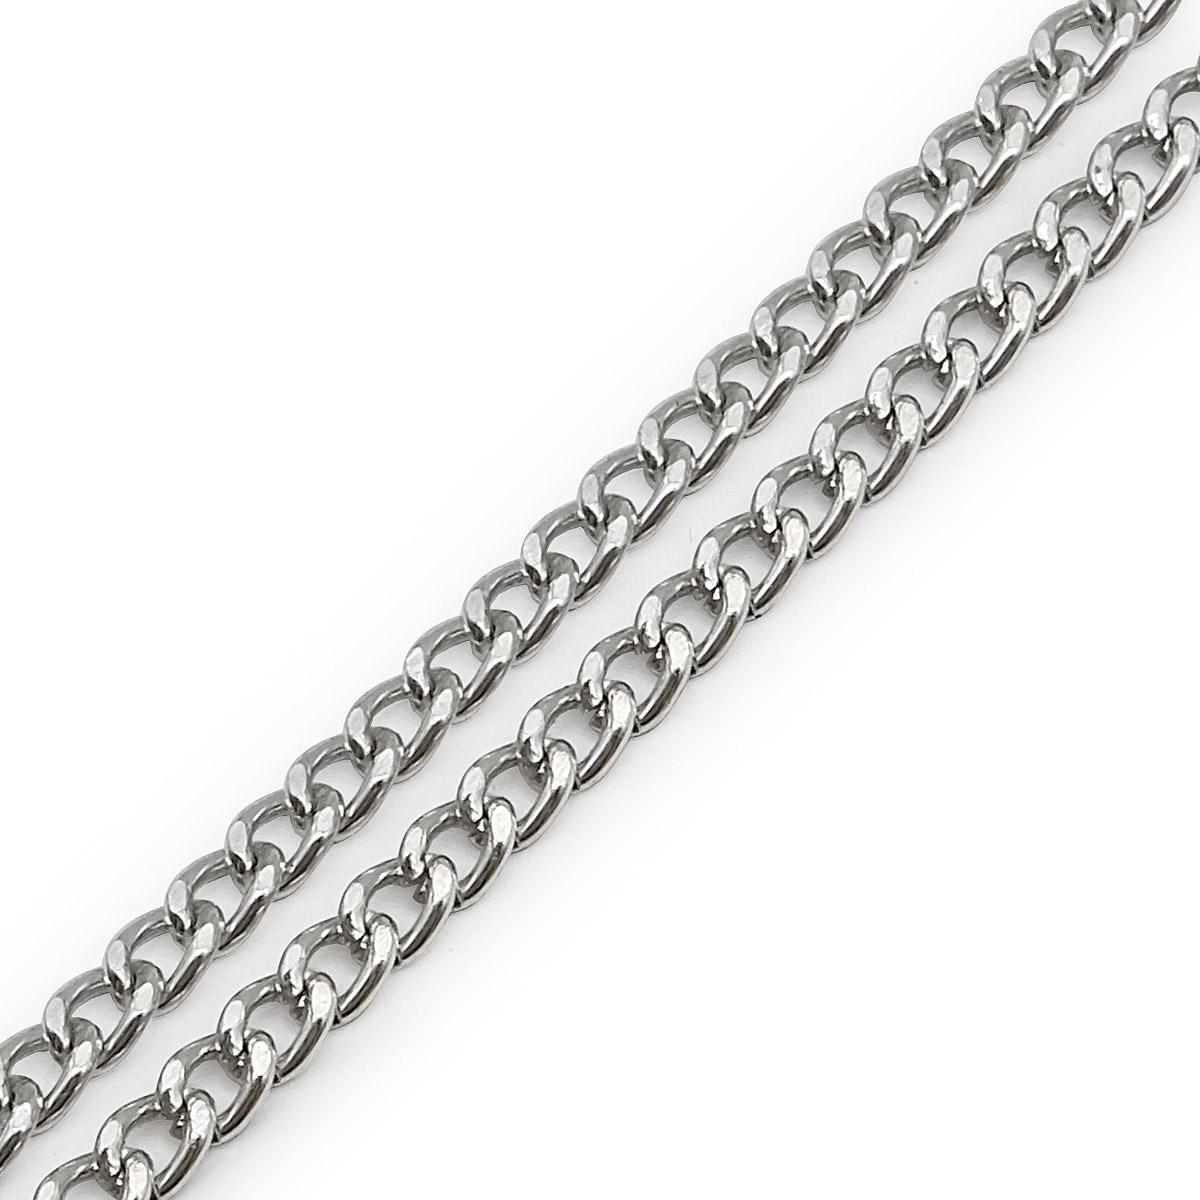 К18602 Цепь алюминиевая, 5,8х4,5 мм (10 м)